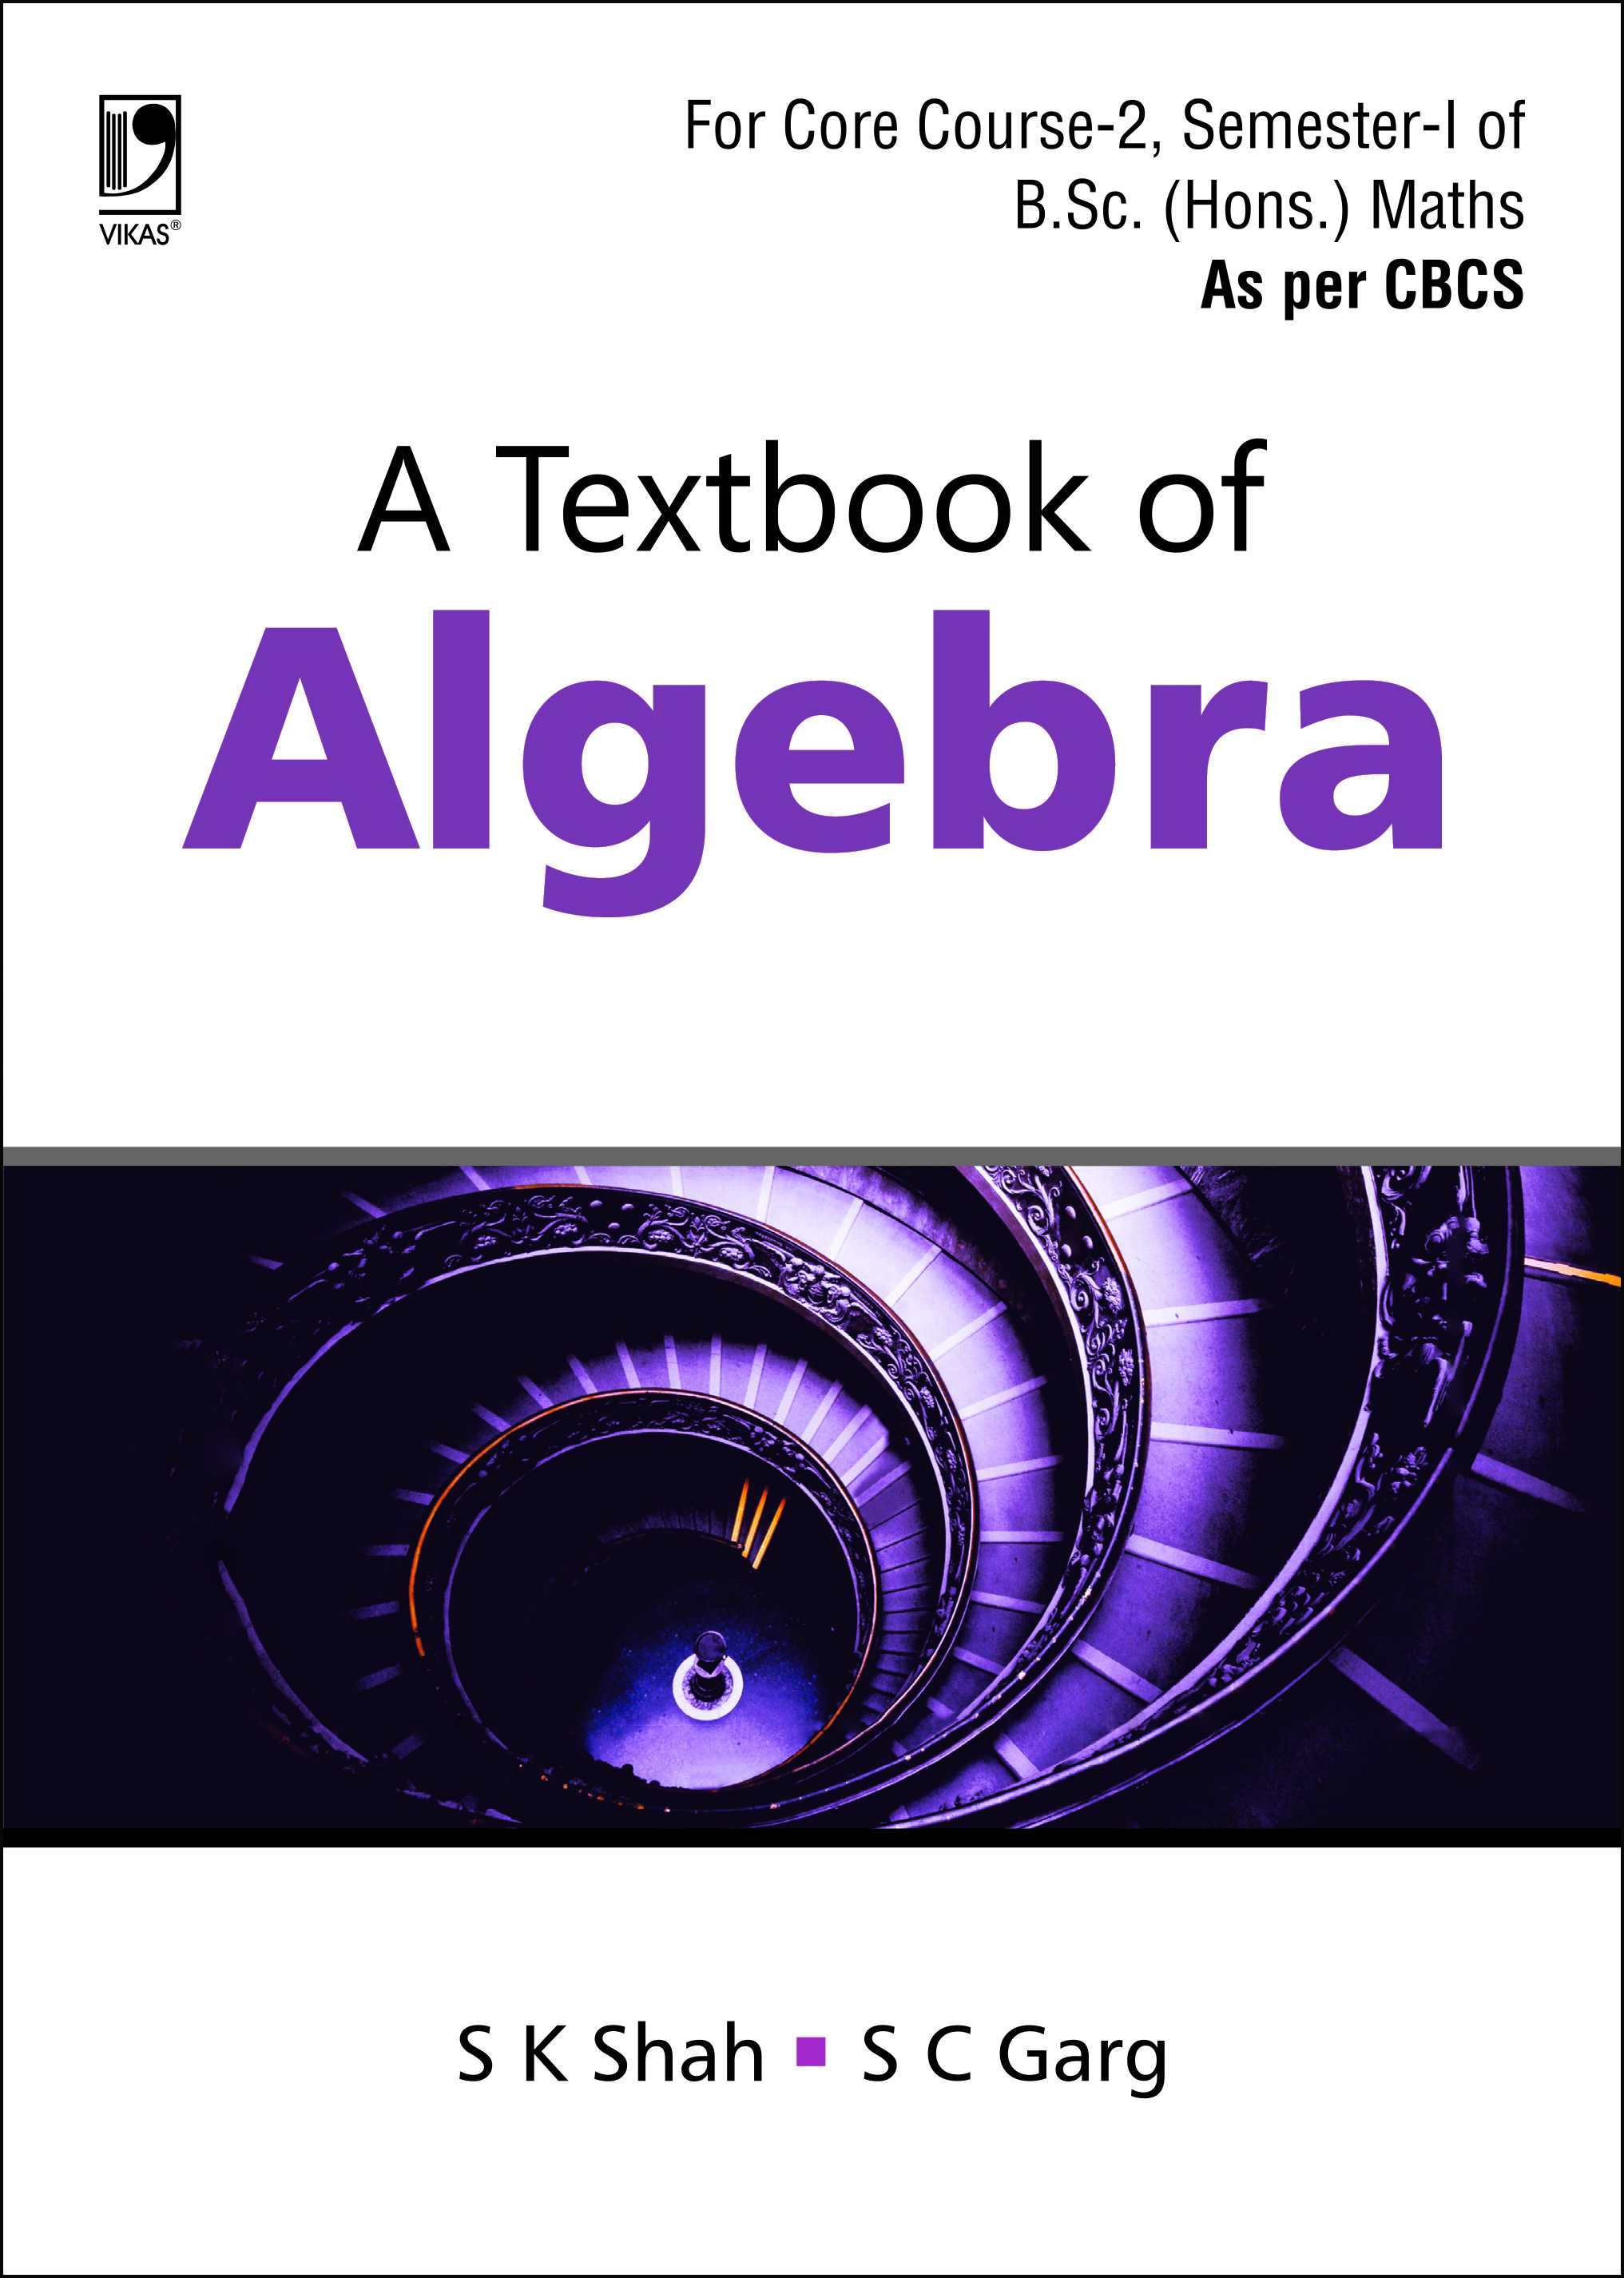 A Textbook of Algebra: (For B.Sc. (Hons.) Semester-I, As per CBCS)